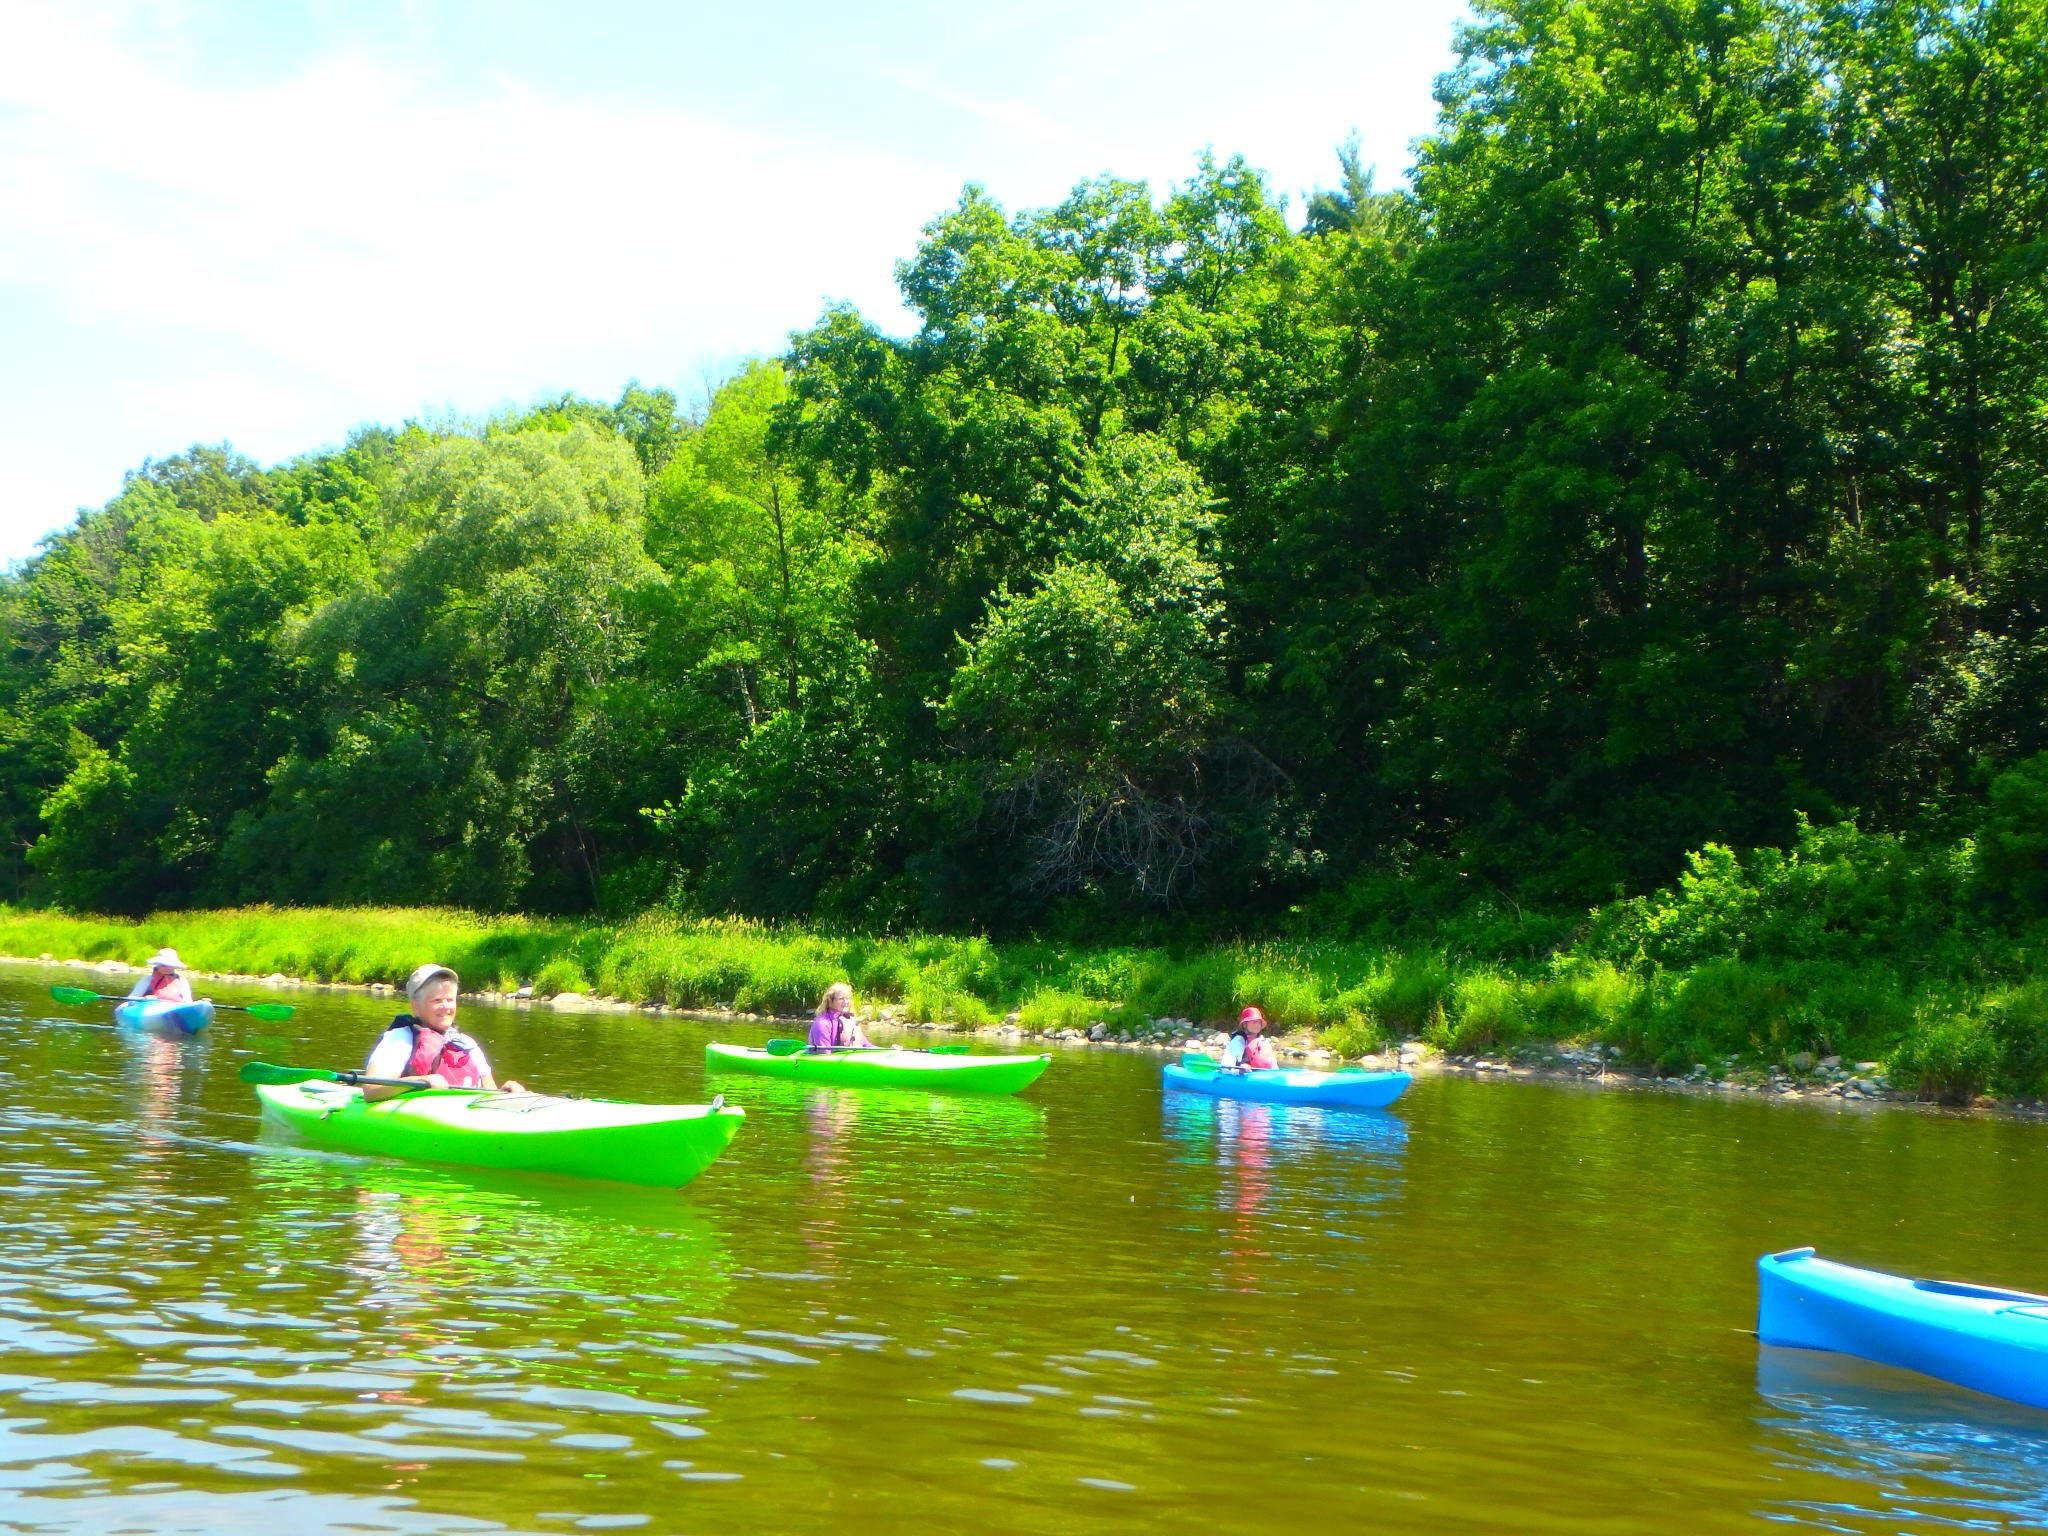 Kayaking Yoga Meditation - Solstice - Jun 21 2018-42